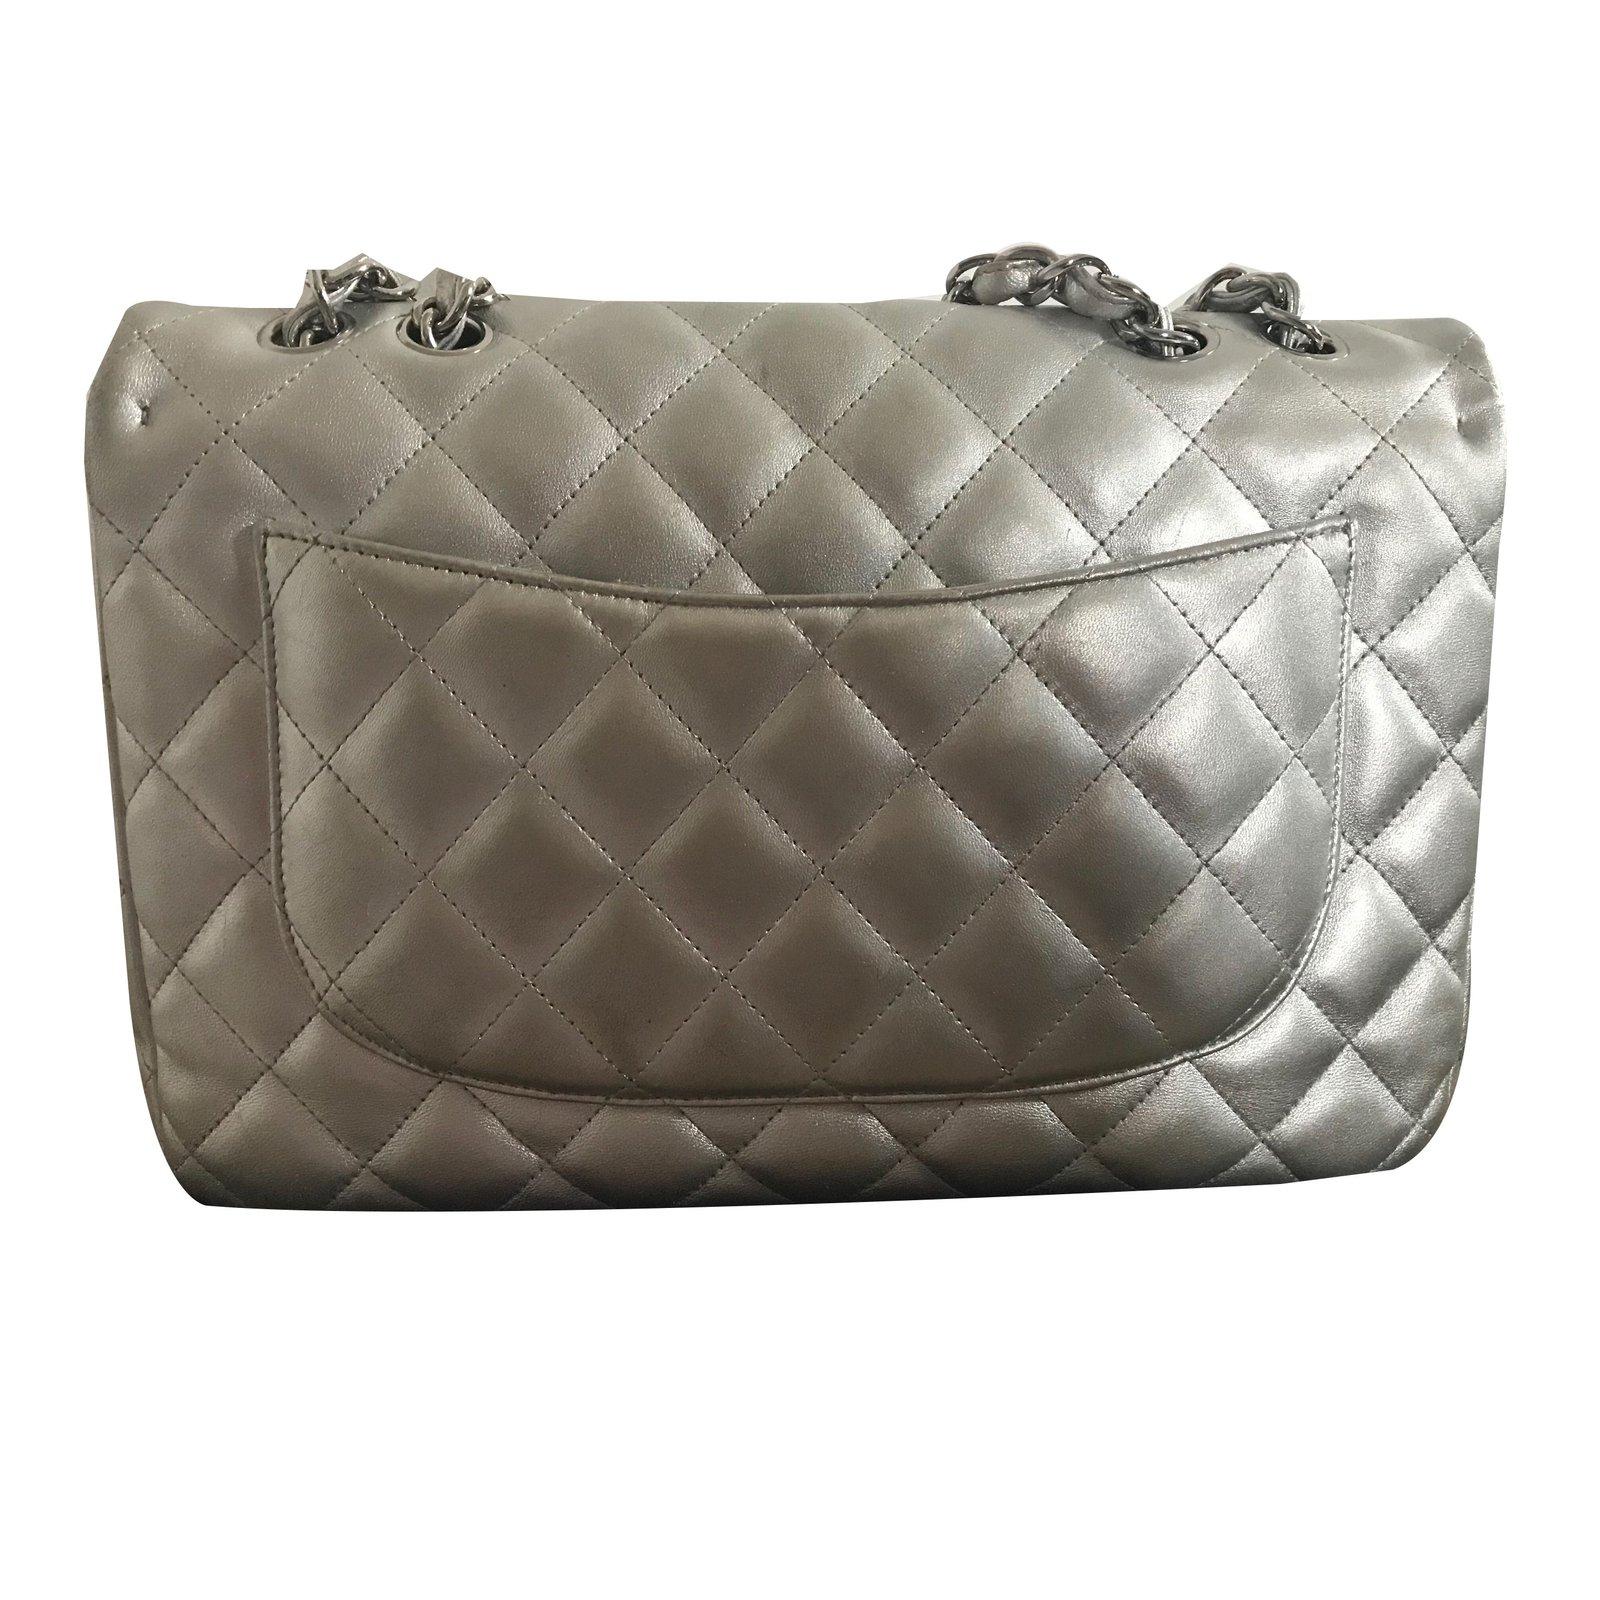 060824754e4f Facebook · Pin This. Chanel Metallic Jumbo Flap Bag Handbags Lambskin Silvery  ref.64207